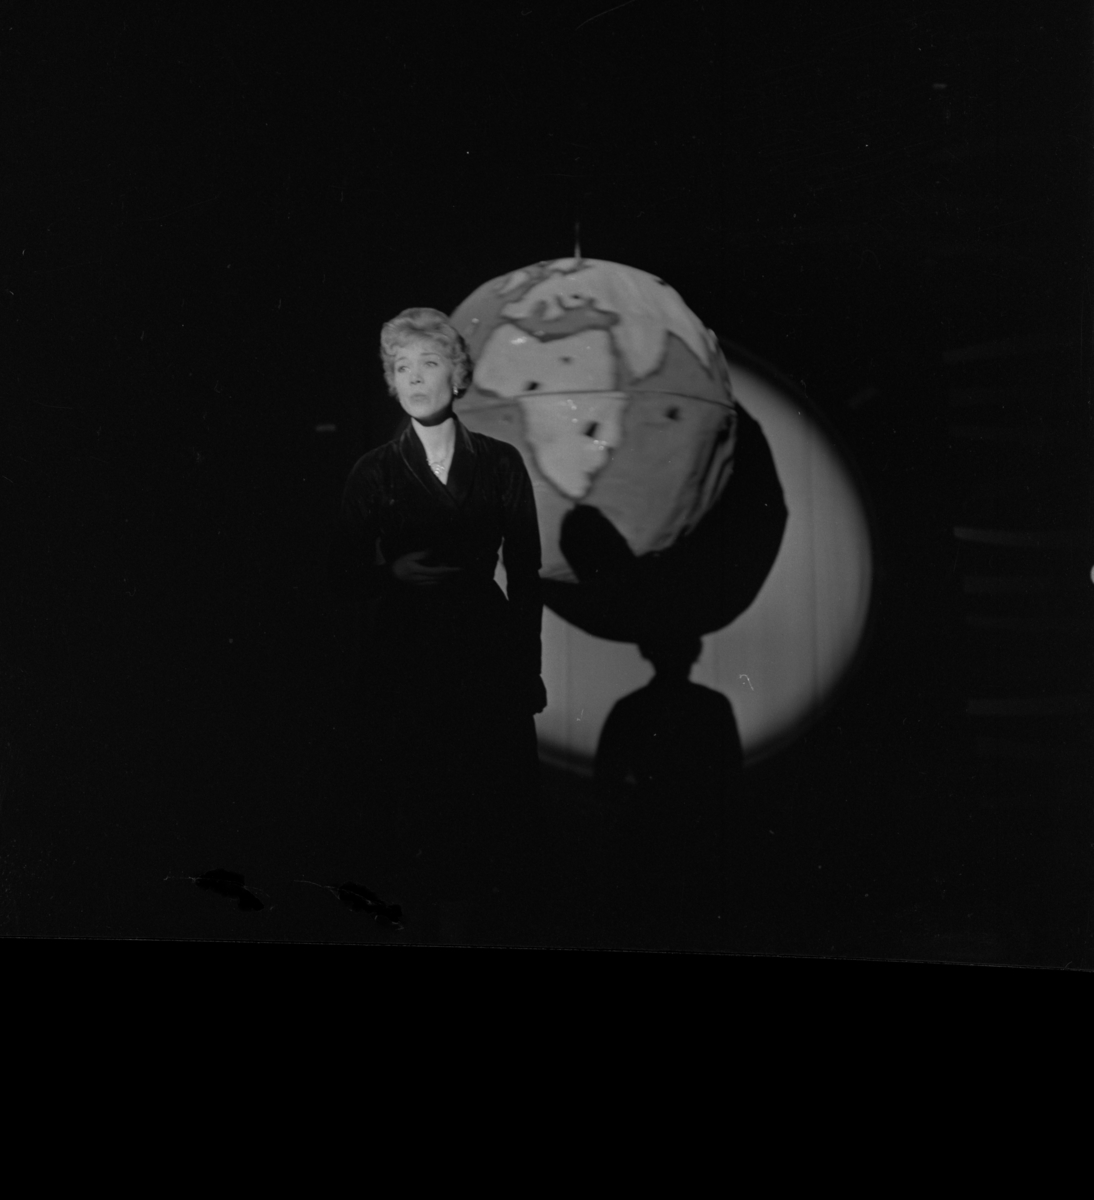 Lokalrevyn 1959 En ensam kvinna på scenen, en jordglob i bakgrunden.